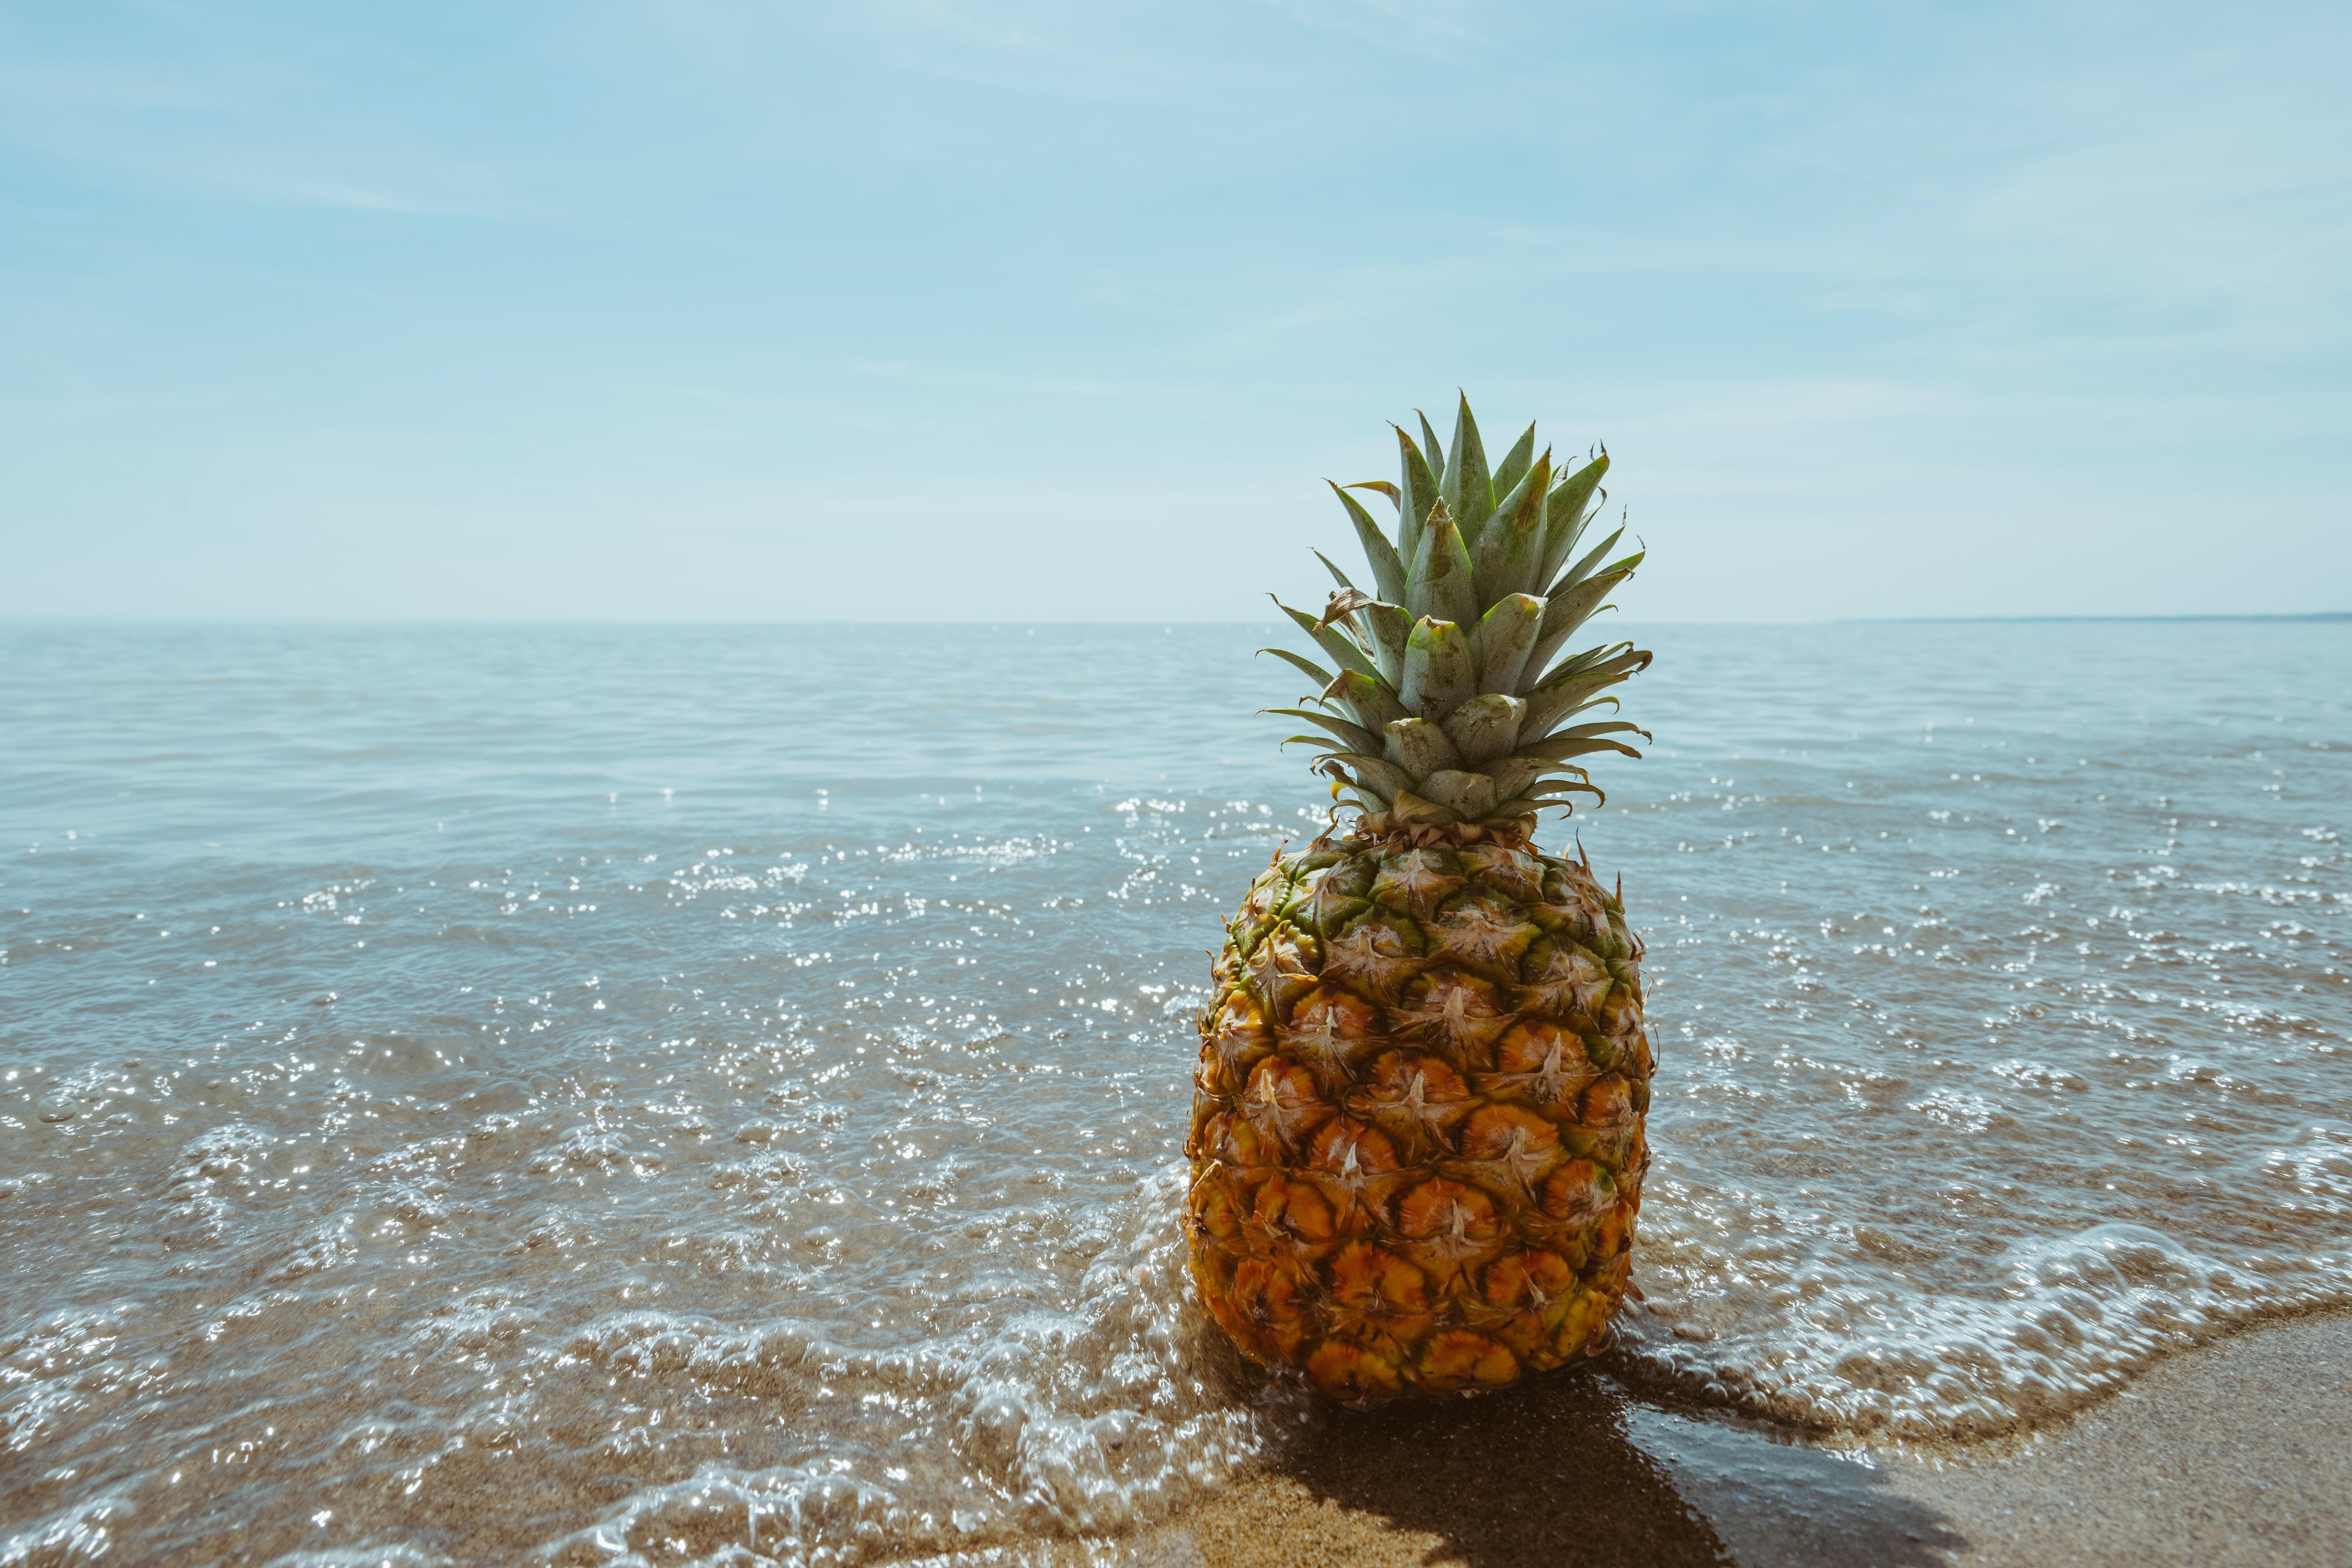 pineapple fruit on seashore